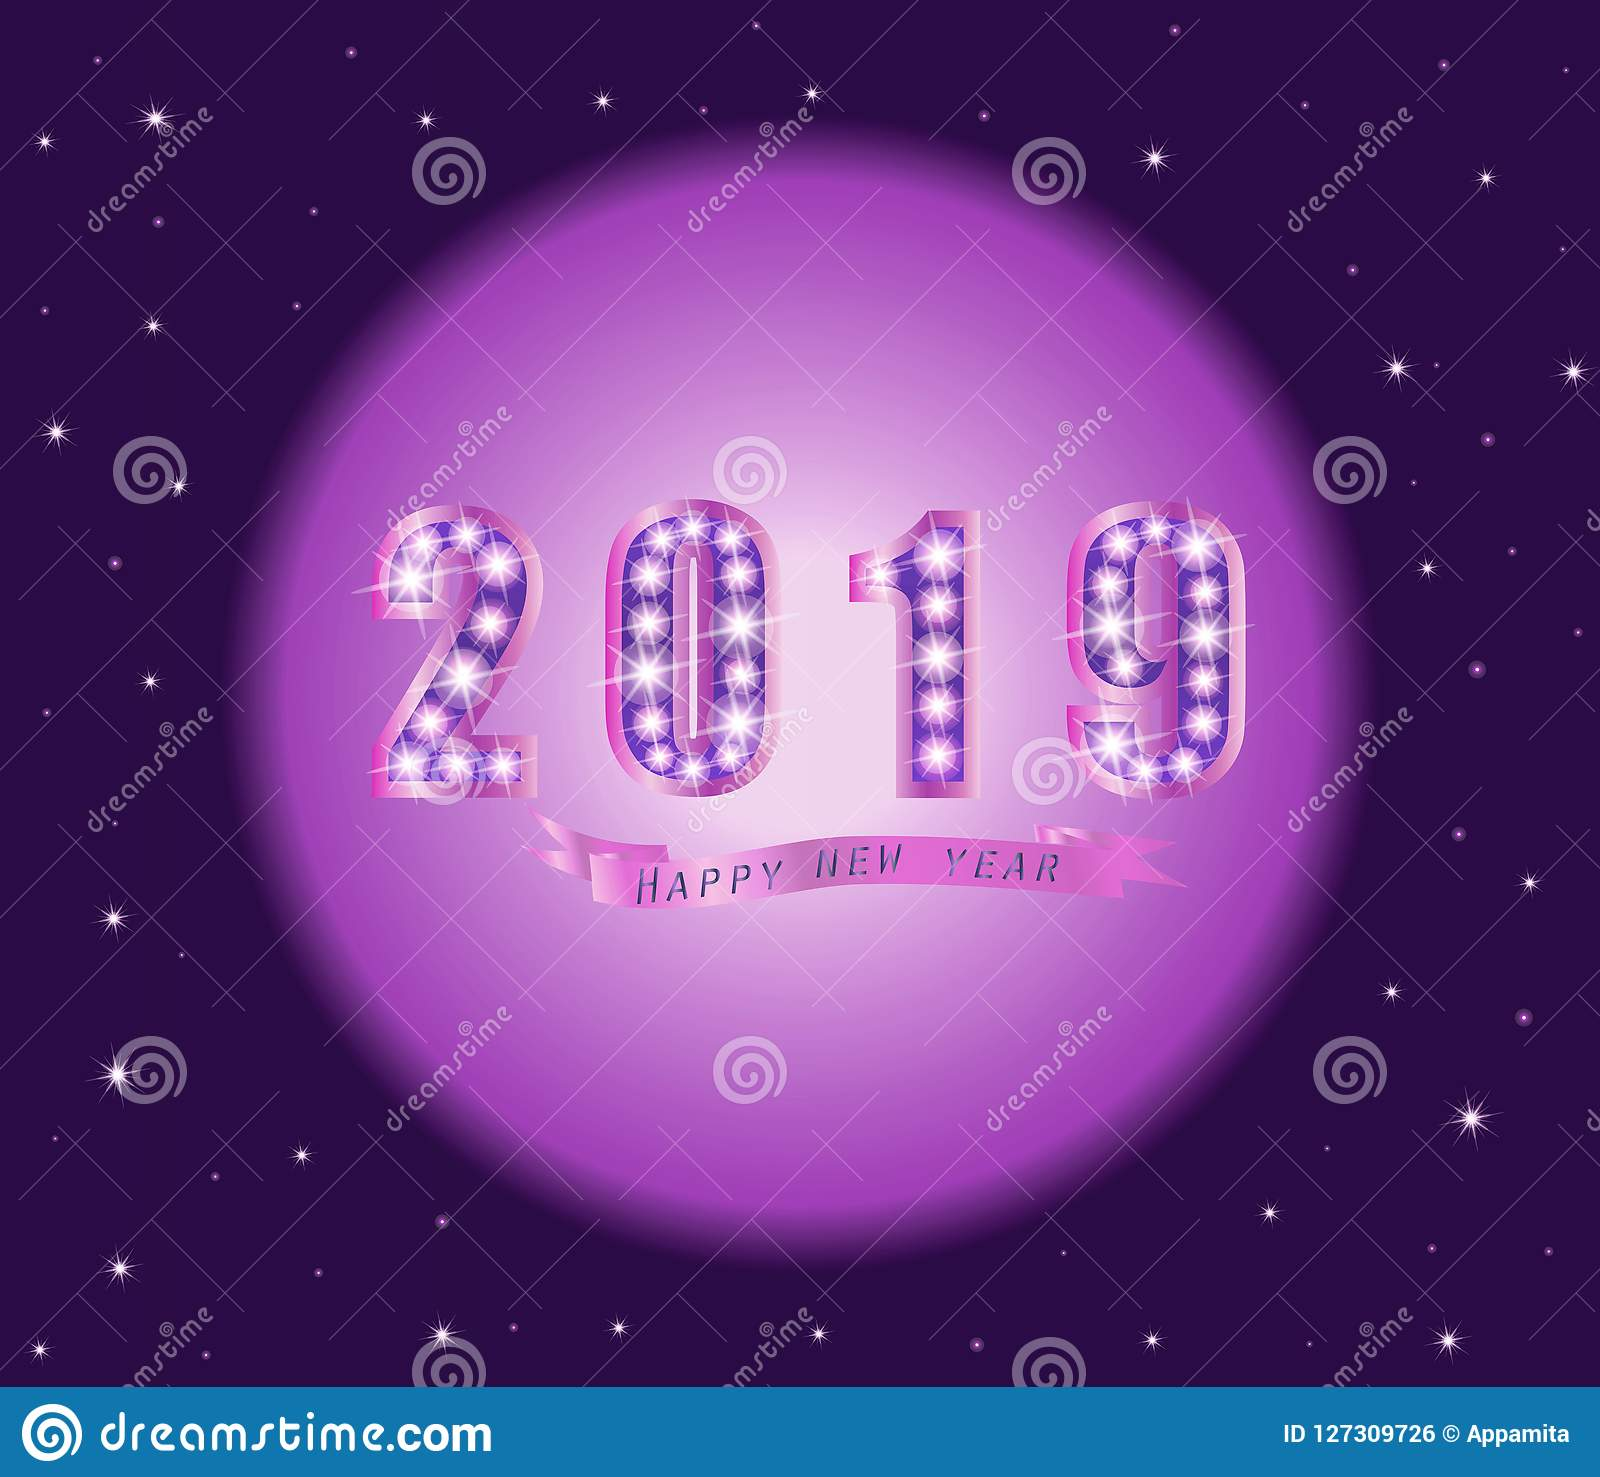 purple happy new year 2019